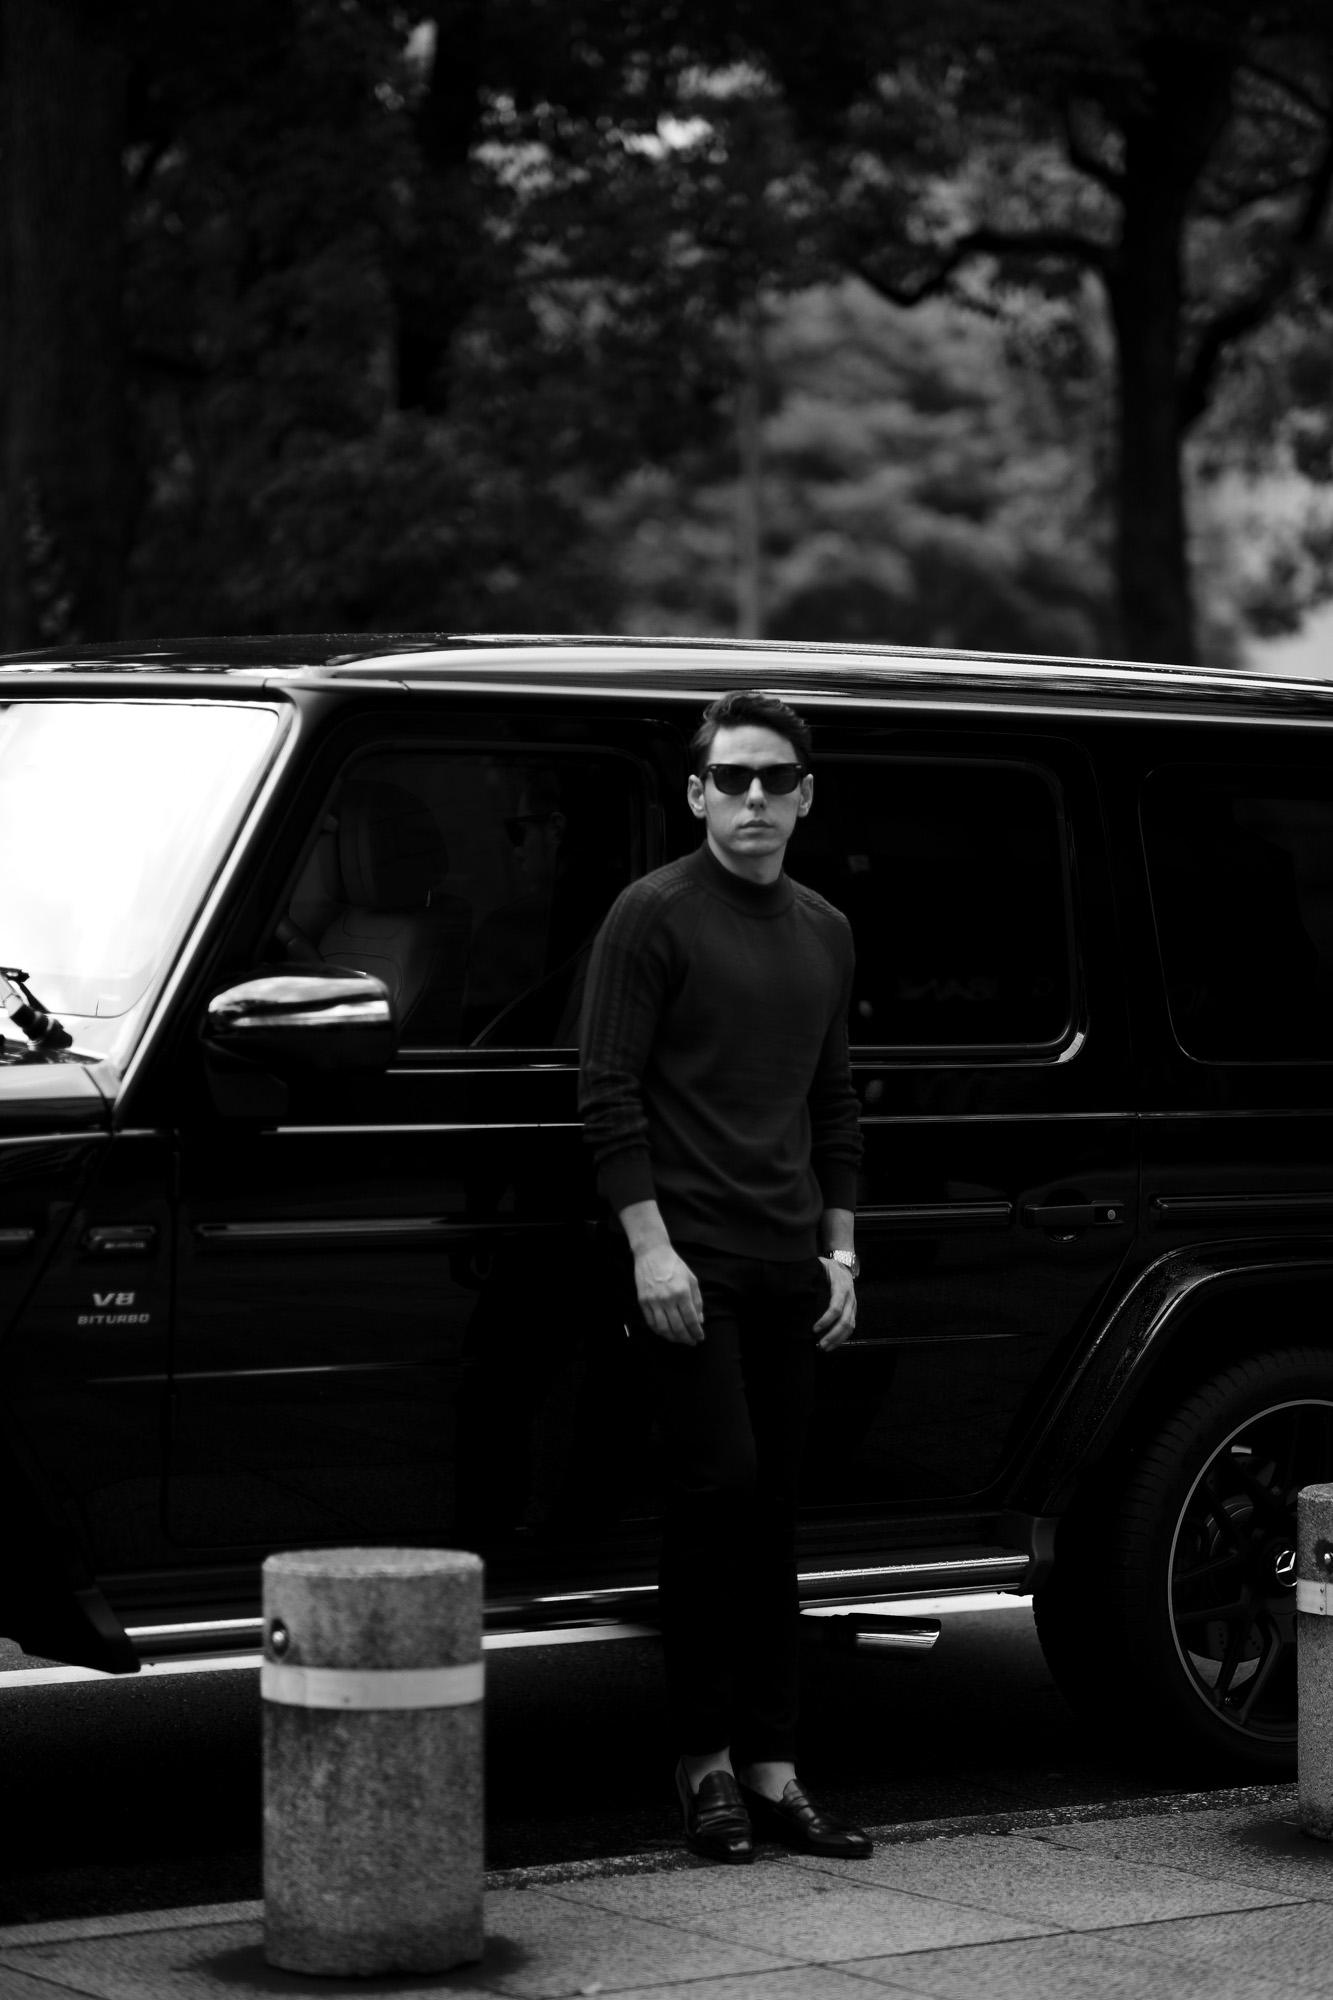 RIVORA (リヴォラ) SIDE CABLE Mock Neck Pull-Over (サイドケーブル モックネック プルオーバー) SUPER120s Wool サイドケーブル ウール モックネック セーター BORDEAUX (ボルドー・150) MADE IN JAPAN (日本製) 2021 秋冬 【Alto e Diritto 別注】【Special Model】Alto e Diritto altoediritto アルトエデリット